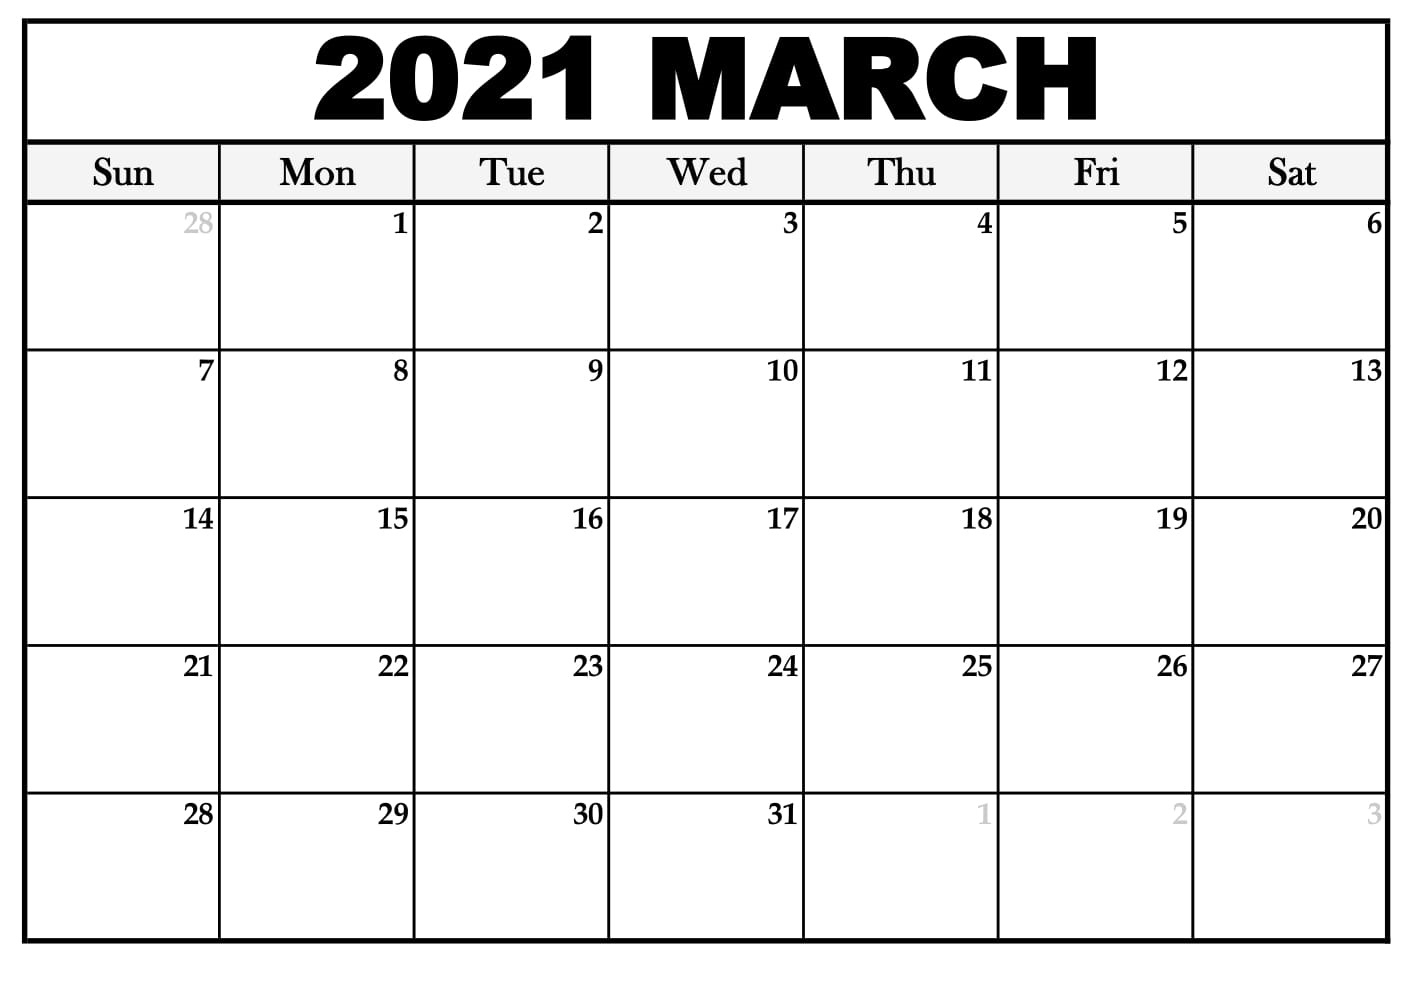 Printable March 2021 Calendar Pdf - Thecalendarpedia